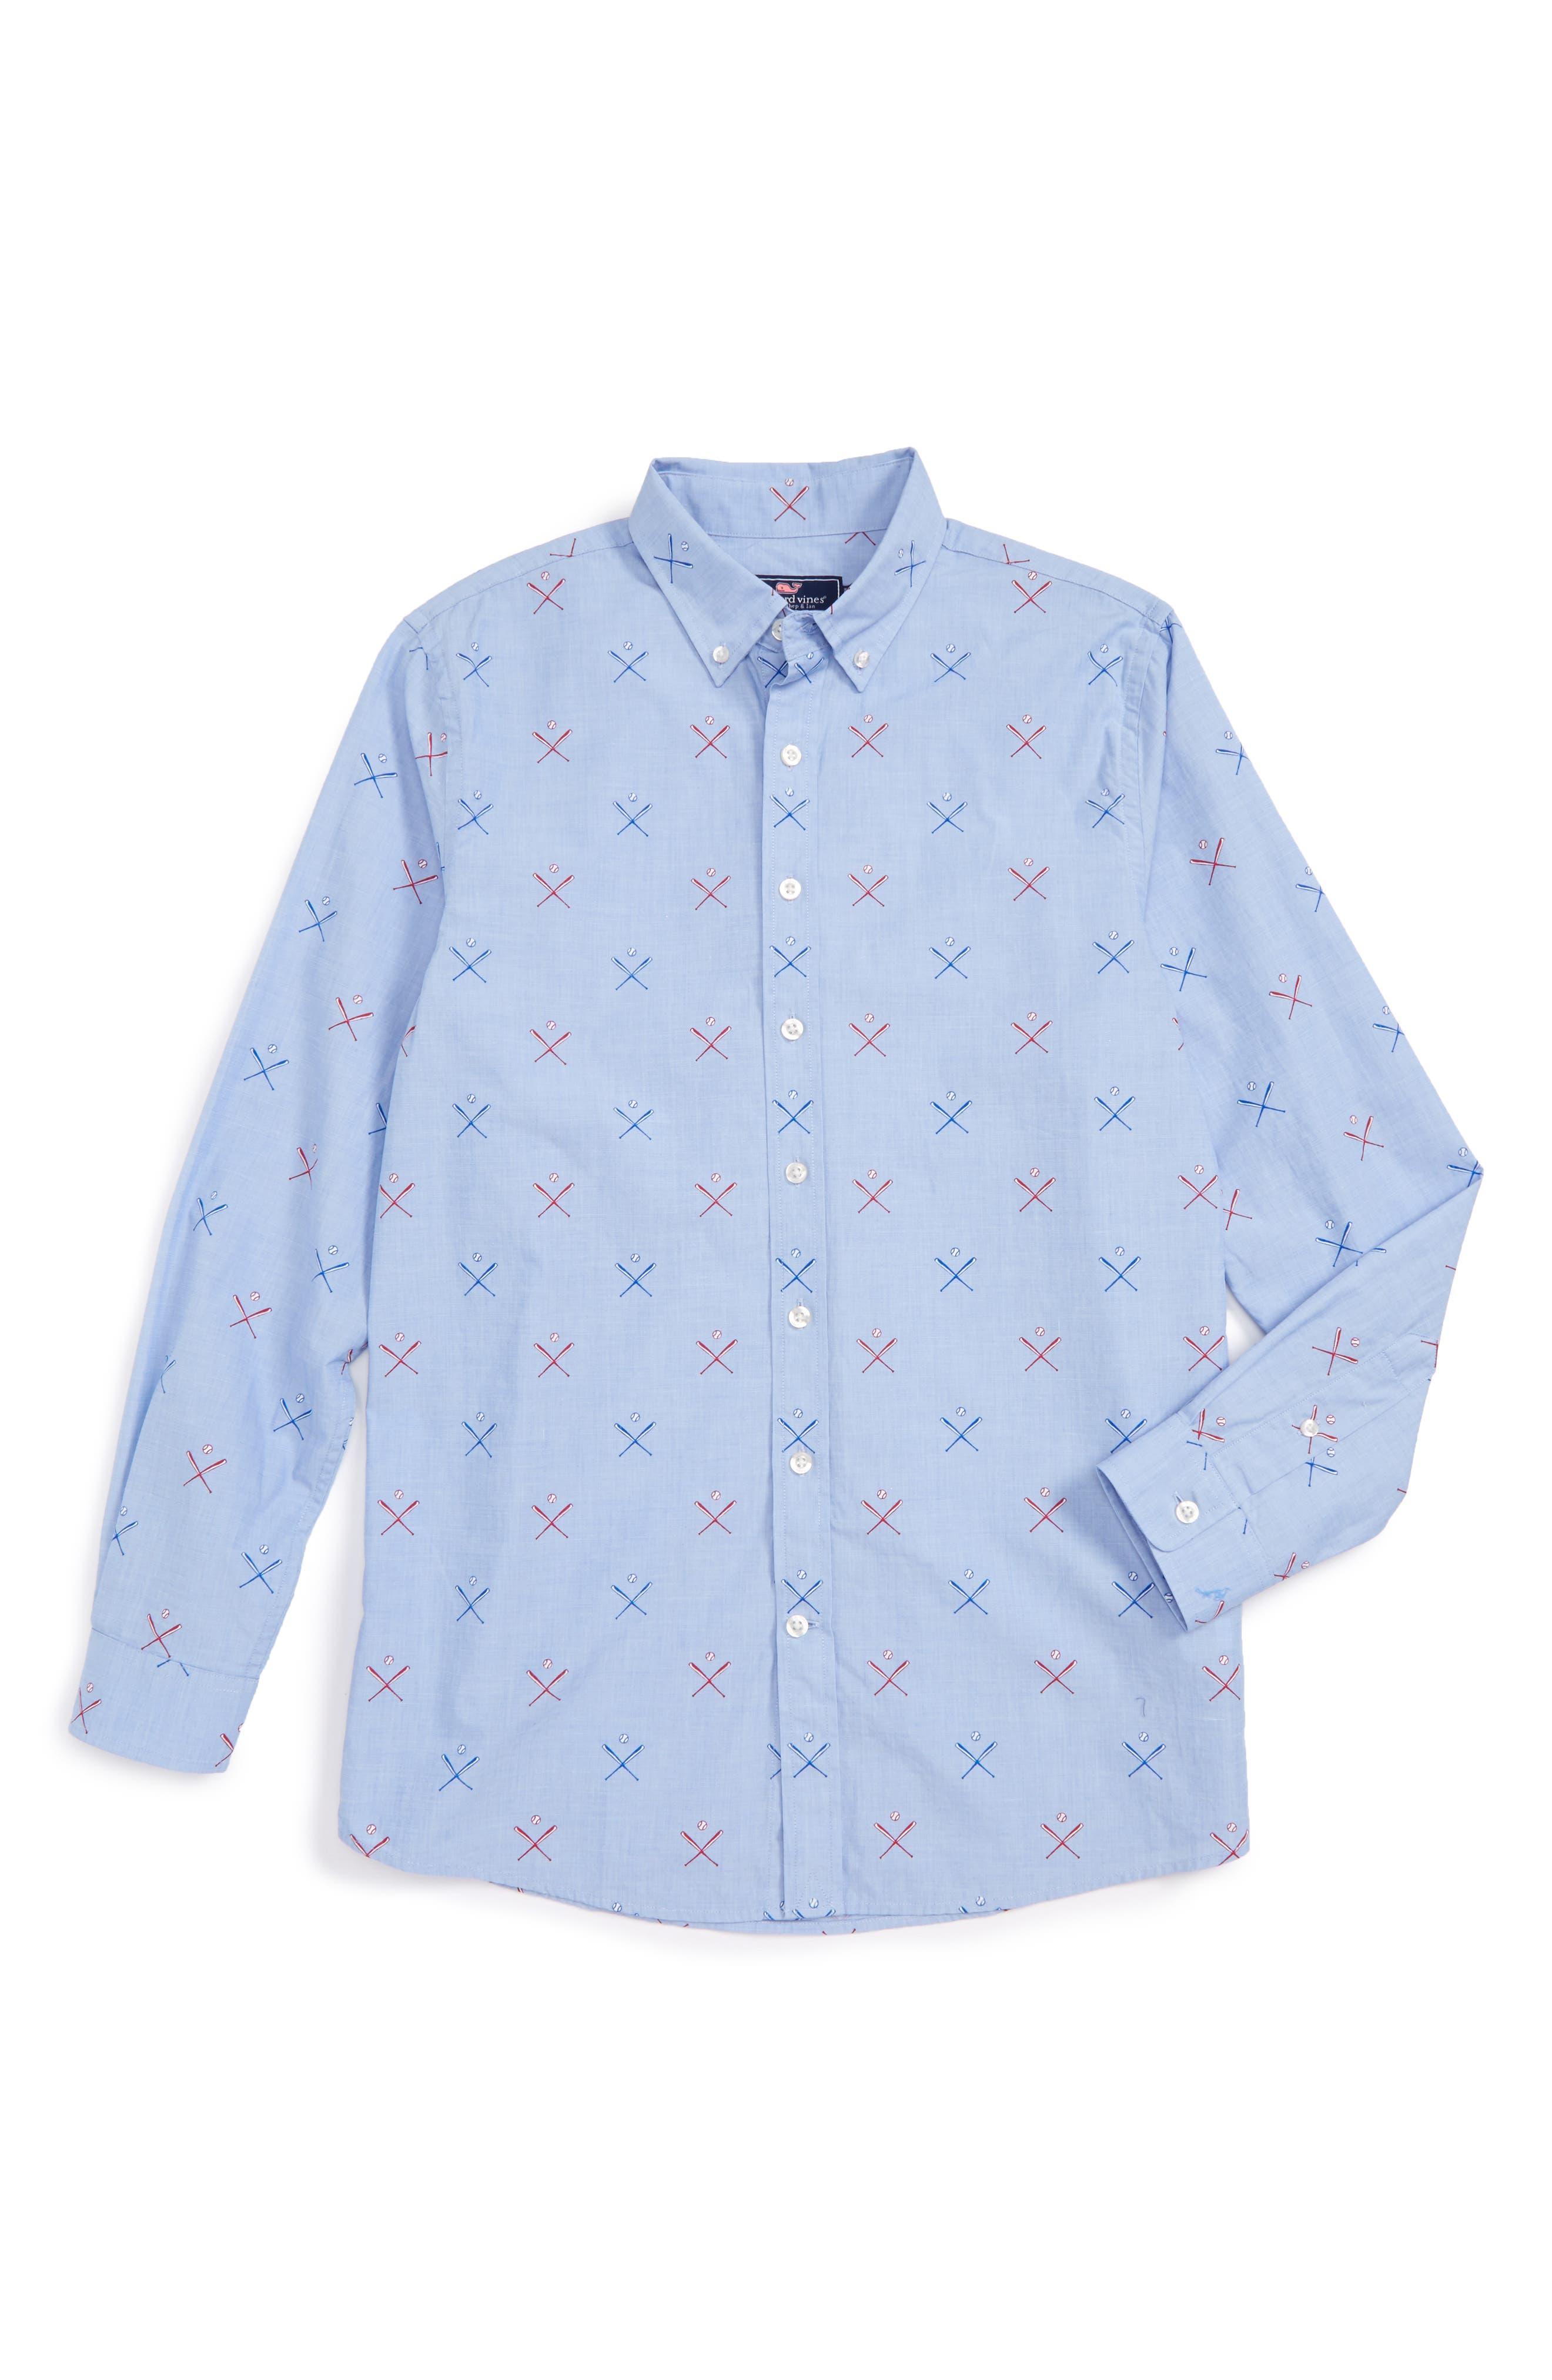 Vineyard Vines Baseball Whale Shirt (Toddler Boys, Little Boys & Big Boys)